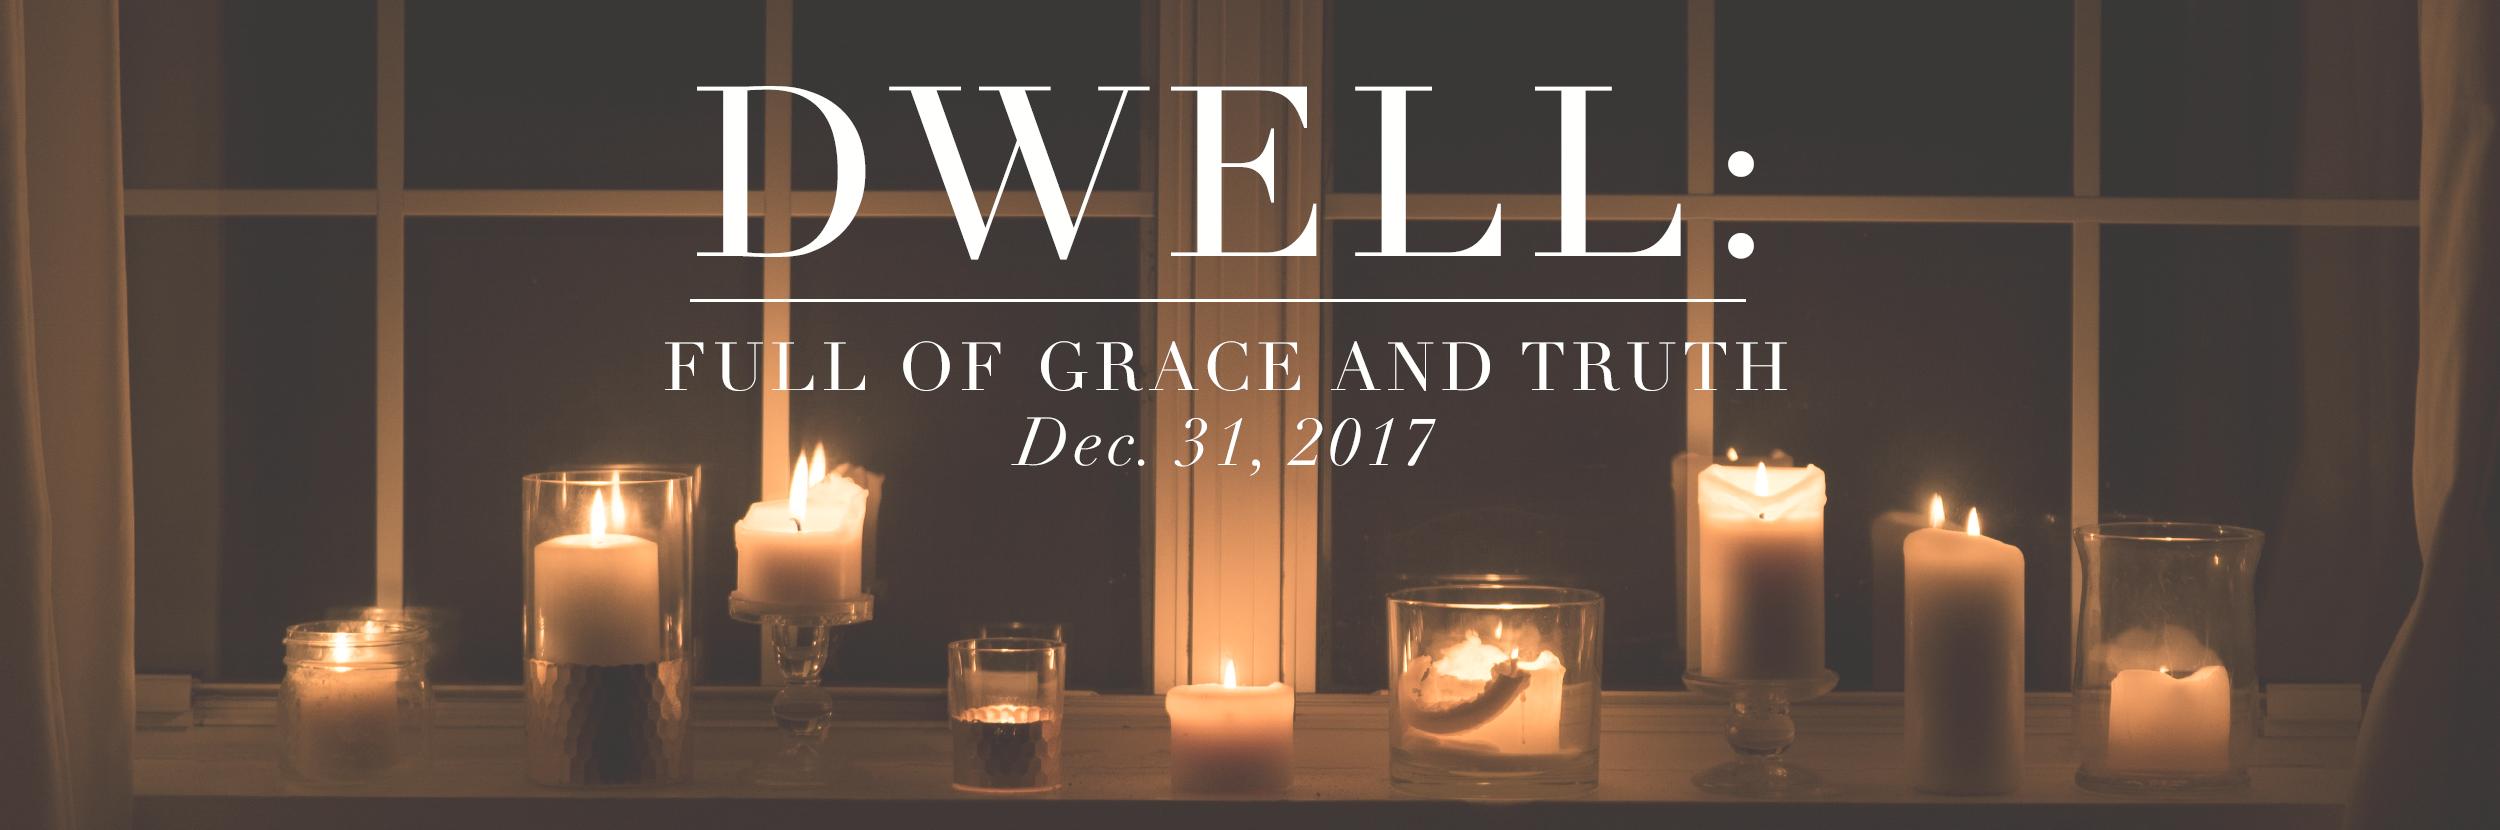 6. Dwell Banenr_Weekly Grace.png